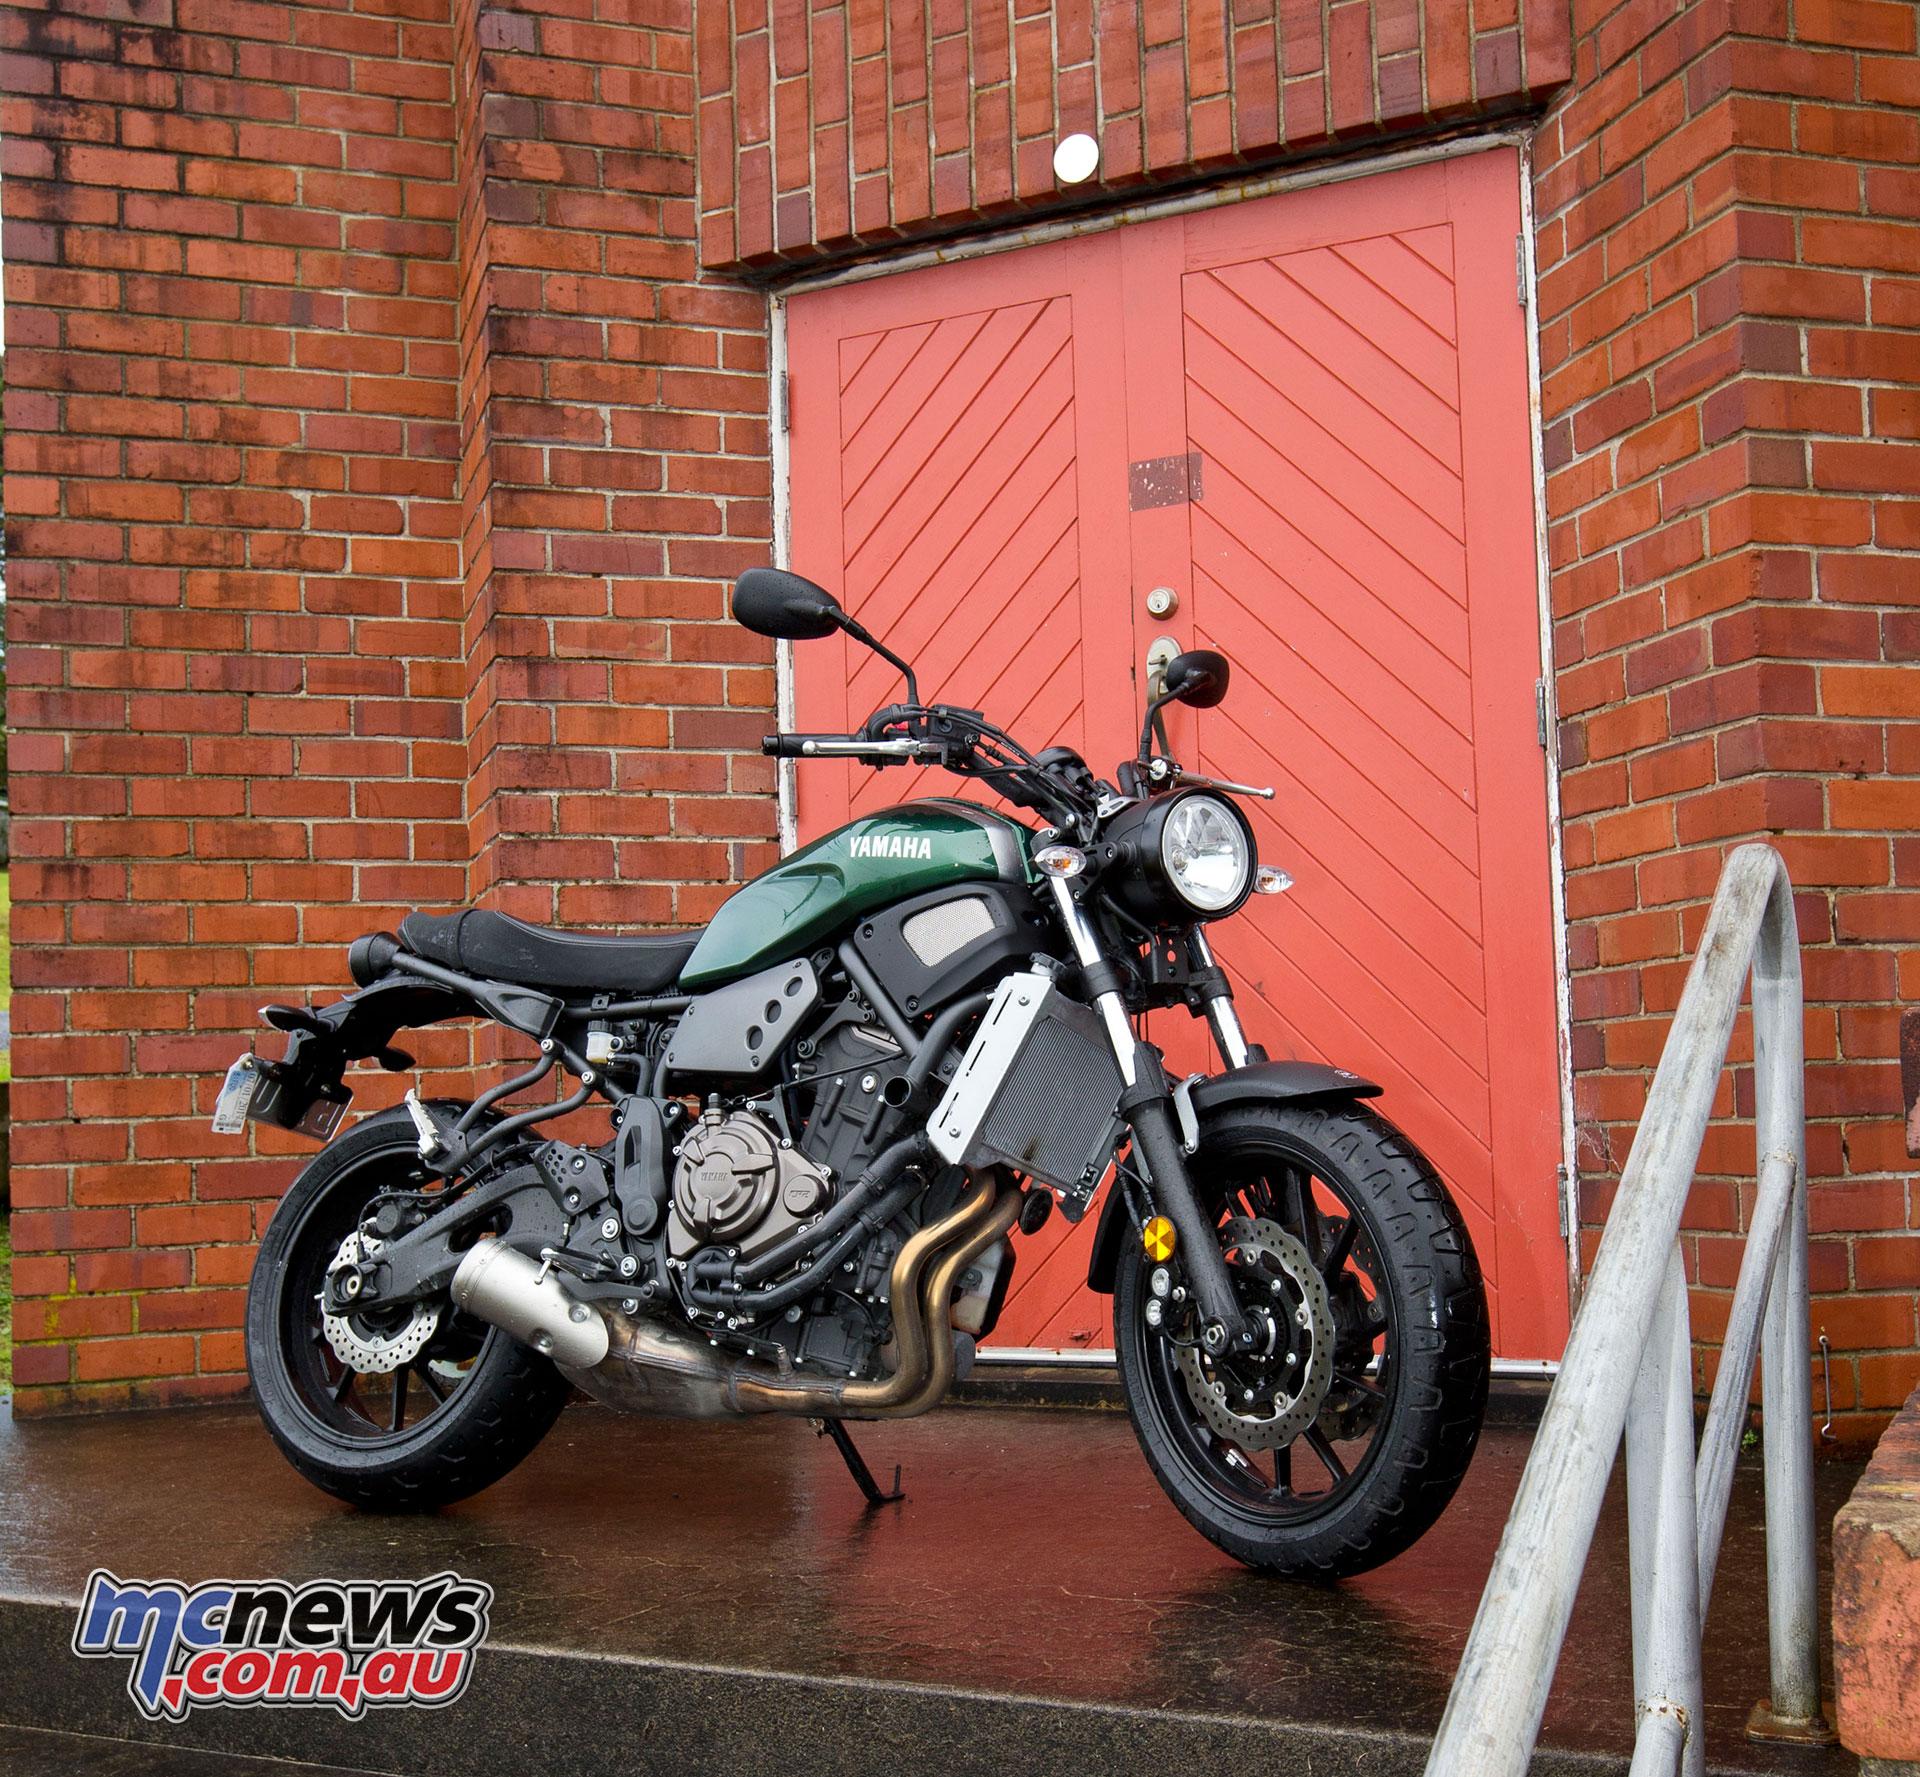 Super Yamaha Xsr700 Review Lams Style Performance Mcnews Evergreenethics Interior Chair Design Evergreenethicsorg